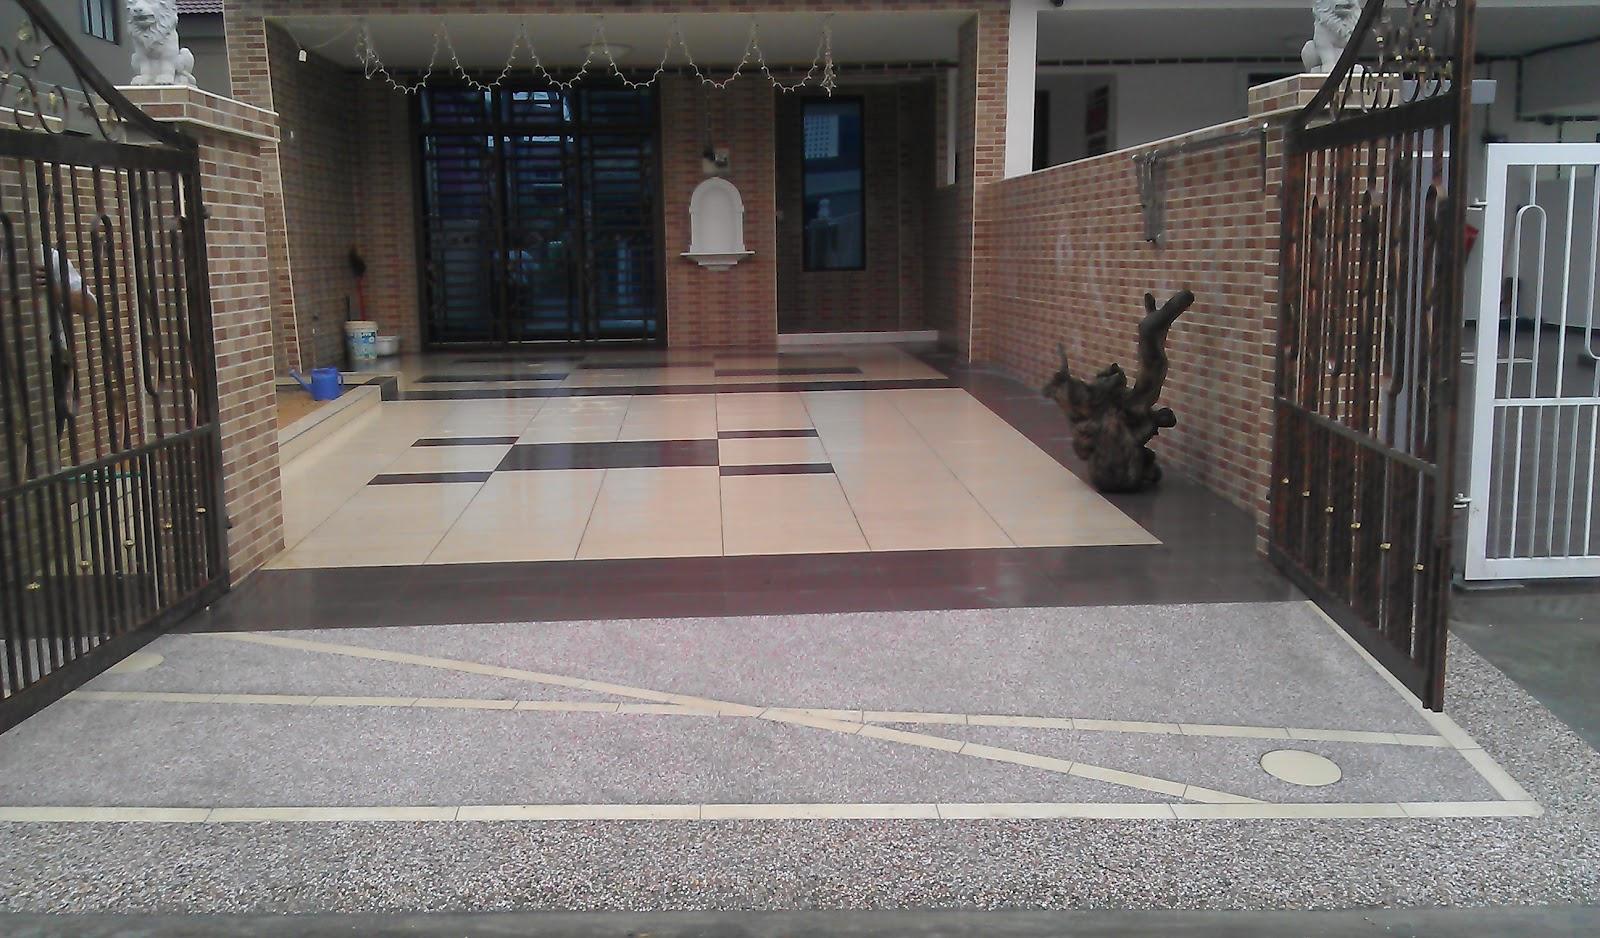 Car Porch Tiles Design Pattern Malaysia Corak Mozek Parking Kereta Desainrumahid Car Porch Mosaic Design Porches Ideas Car Porch Tiles Malaysia Studio Design Gallery Best Design Naluri Kehidupanku Rumah Idea Of